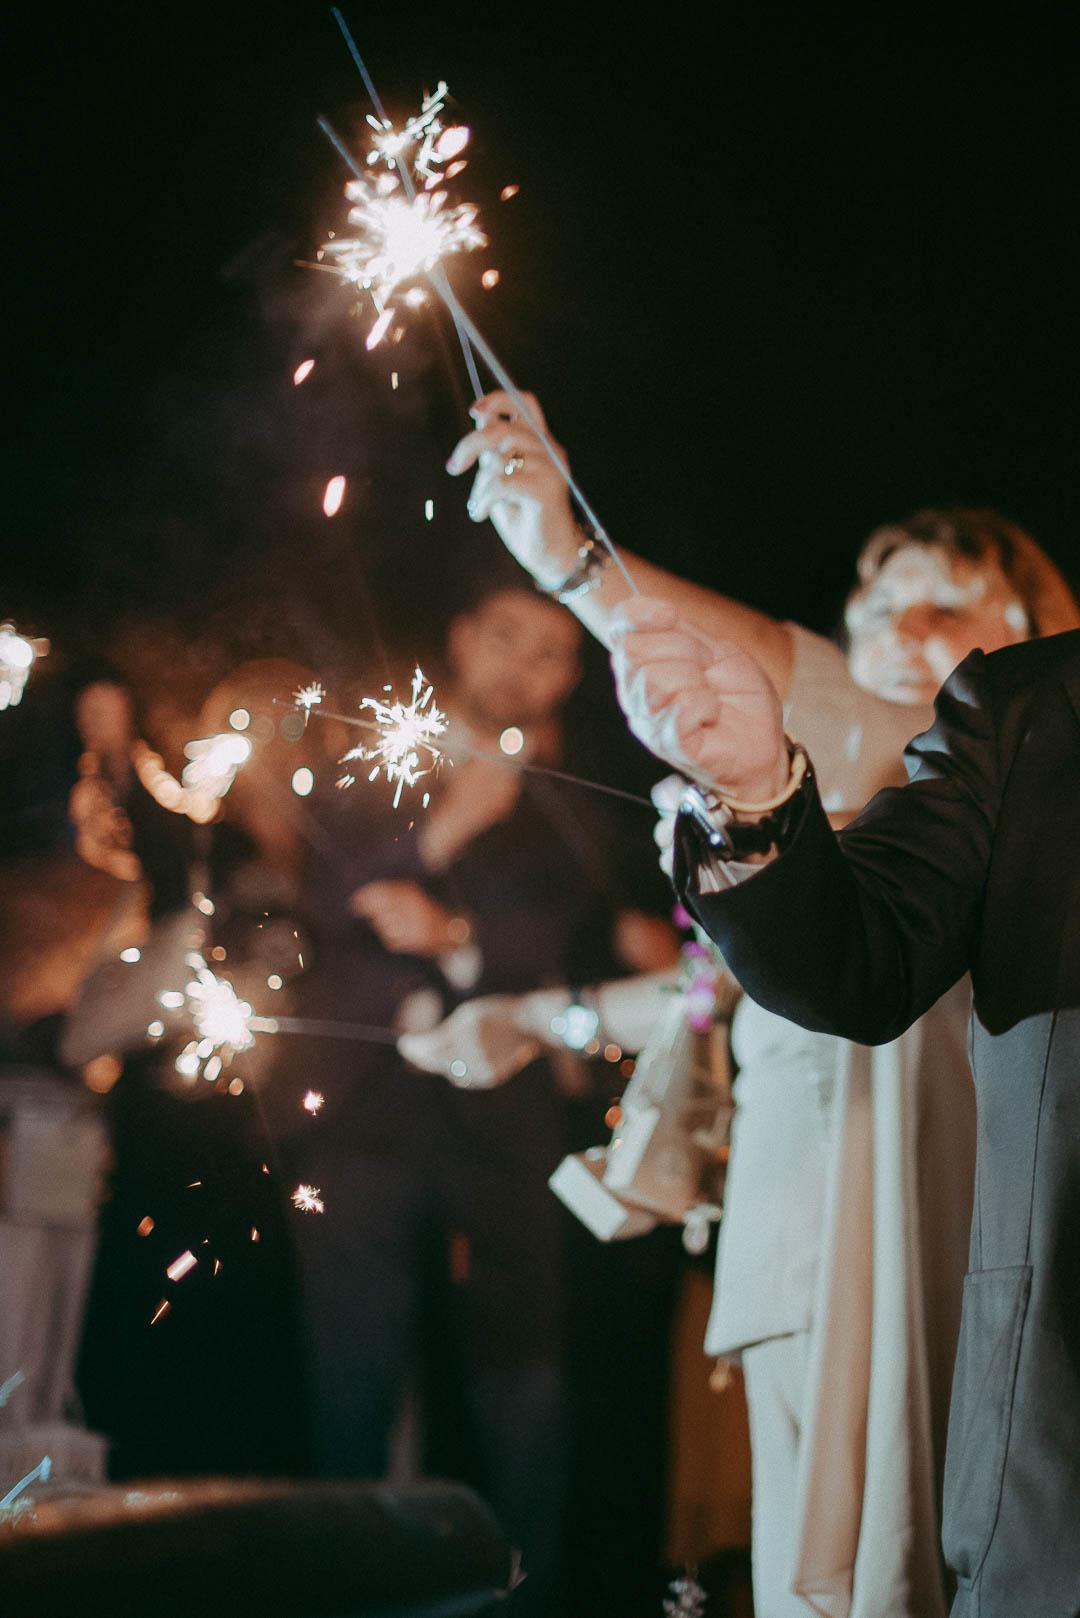 wedding-photographer-destination-fineart-bespoke-reportage-amalficoast-torrelacerniola-vivianeizzo-spazio46-99